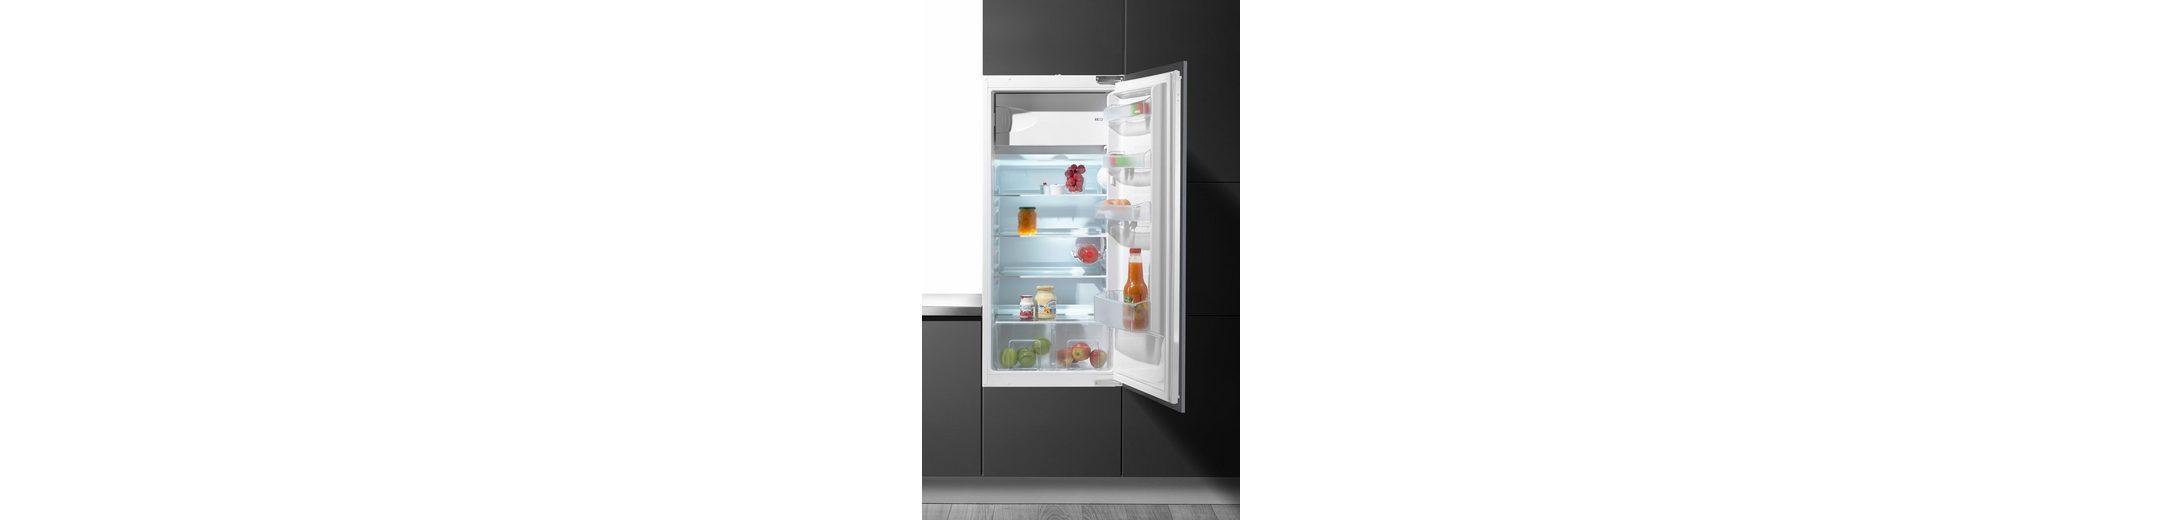 Beko integrierbarer Einbaukühlschrank »RBI 2301«, A+, 122 cm